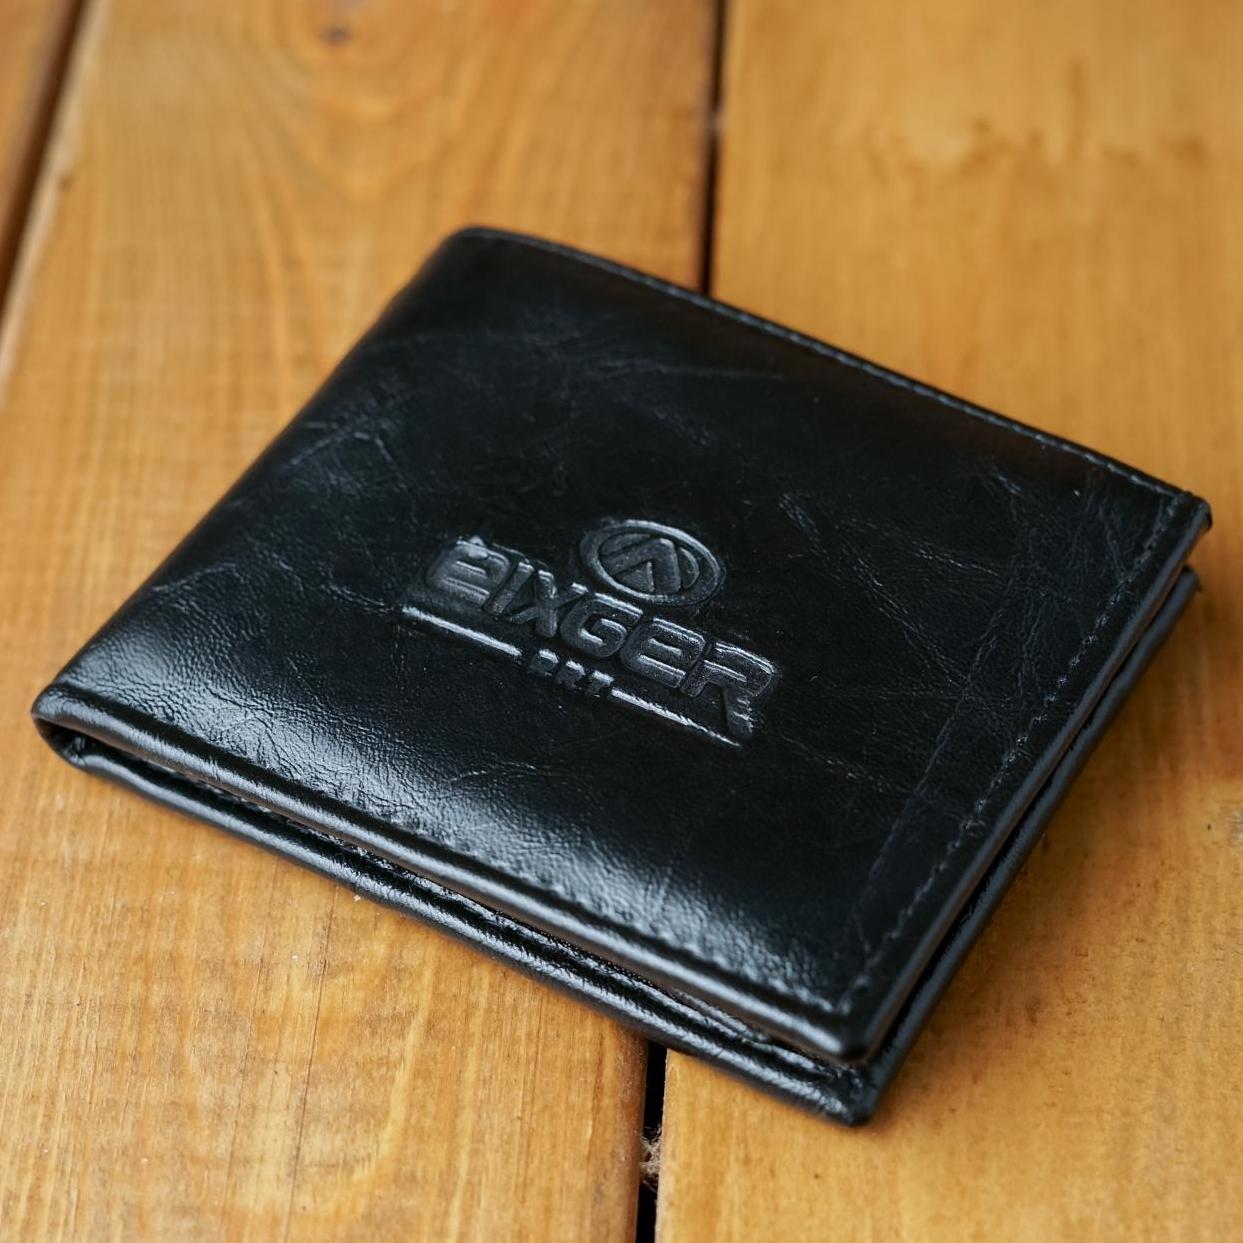 Dompet pria kulit sintetis minimalis-Dompet classic elegant-Dompet lipat 2- Dompet murah